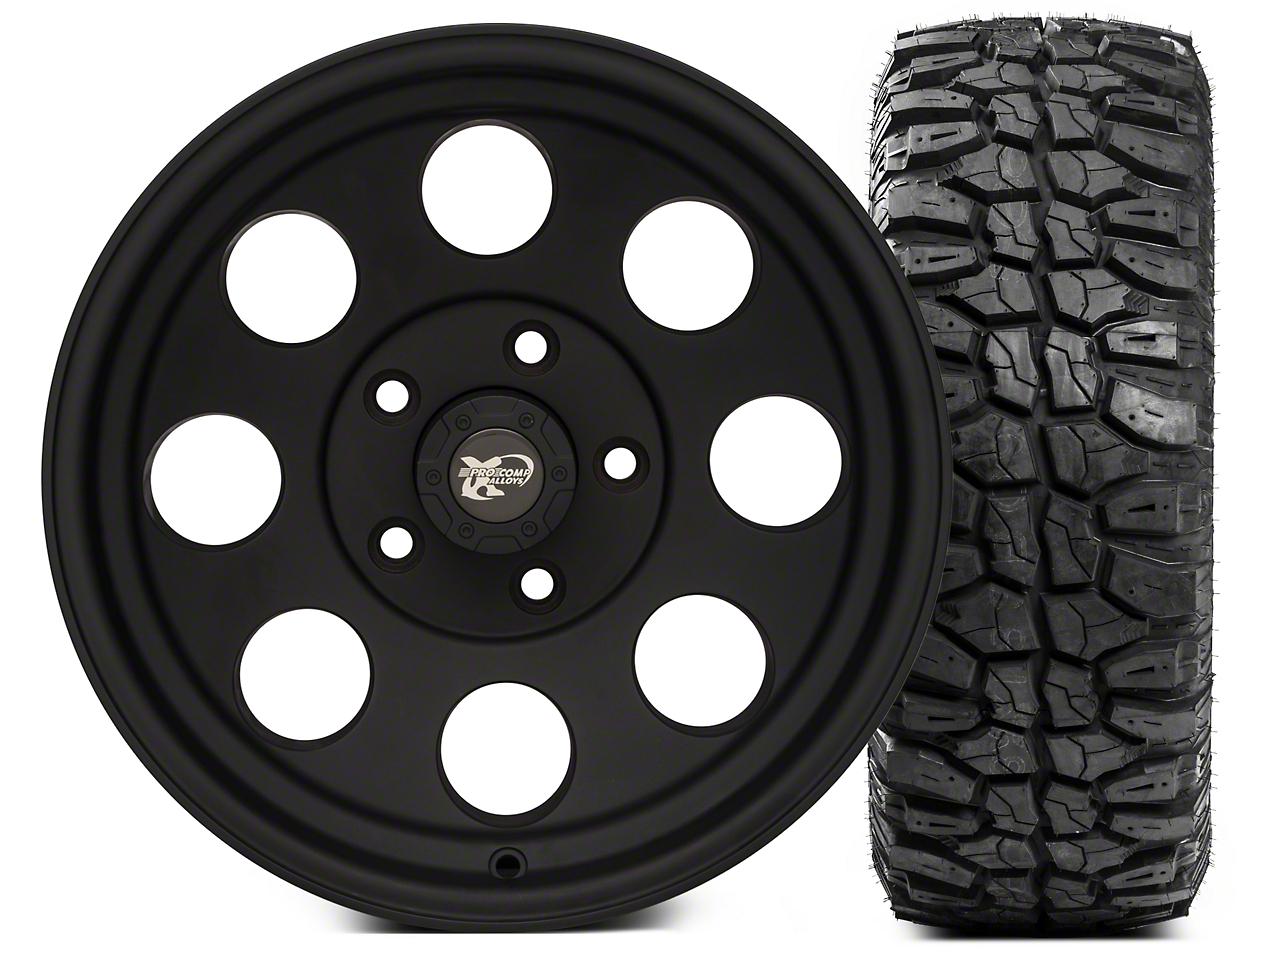 Pro Comp Alloy Series 7069 16x8 Wheel - and Extreme M/T 285/75/16 Kit (07-18 Wrangler JK)